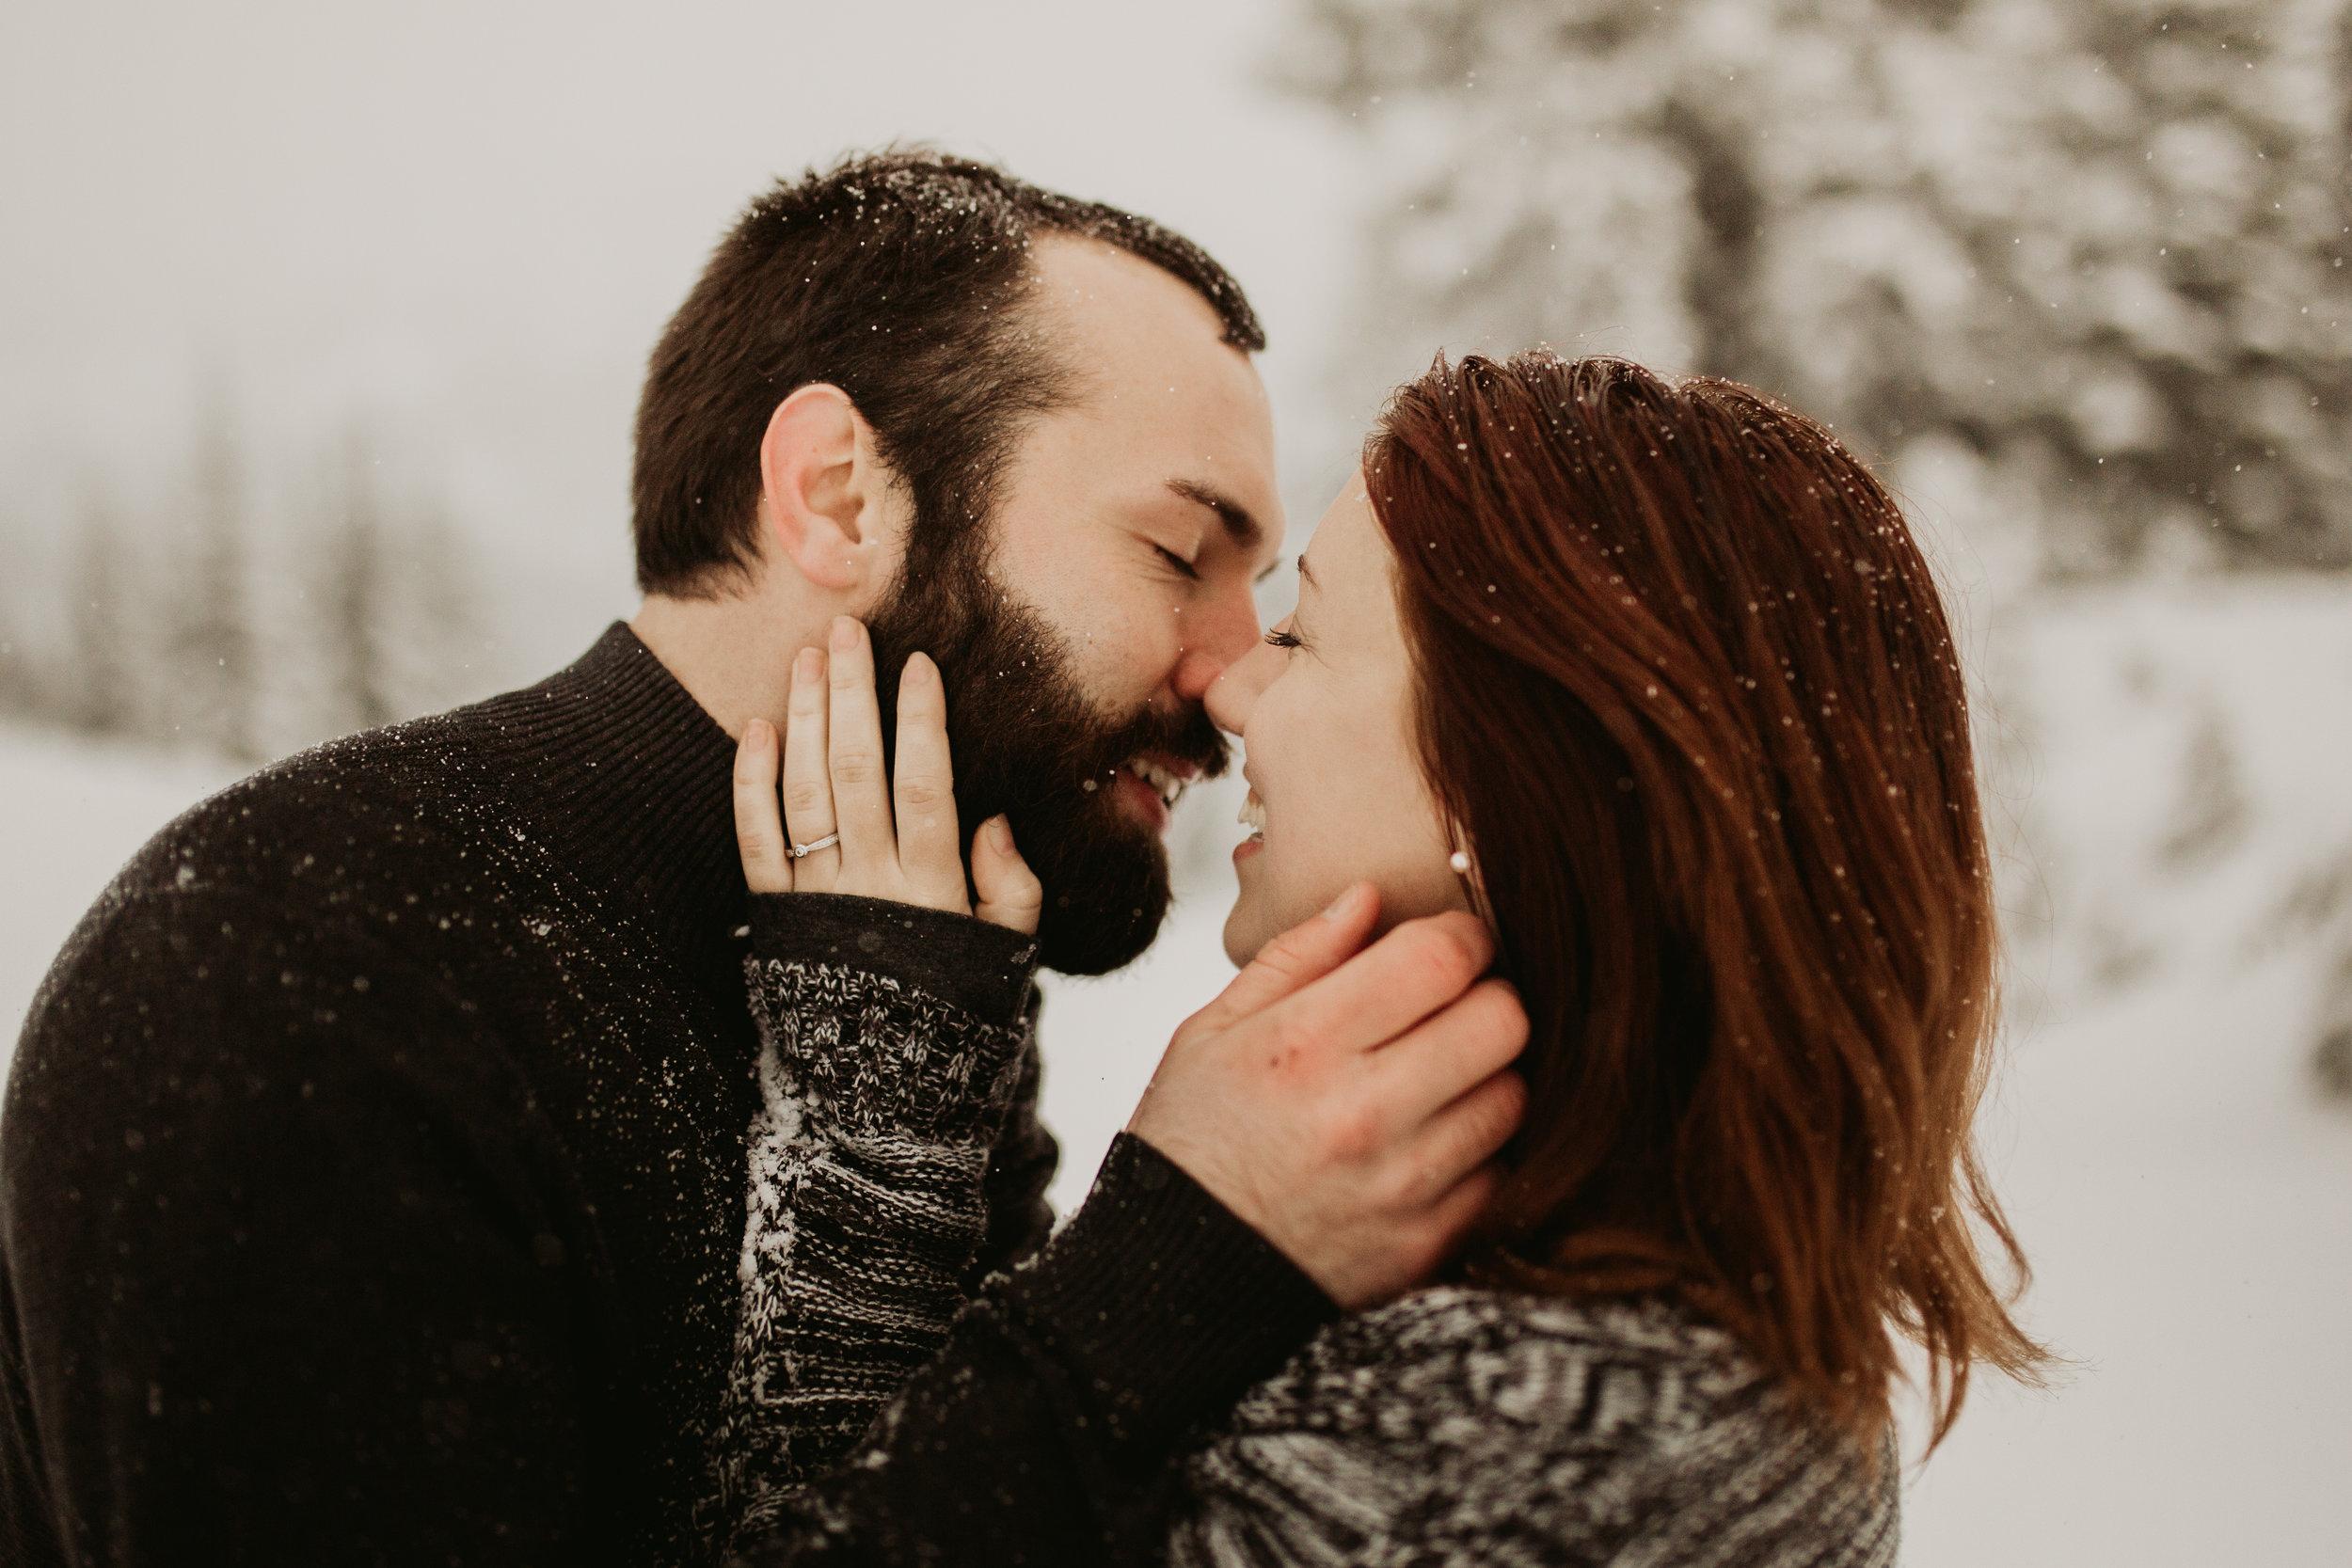 pnw_washington_oregon_elopement_mount_rainer_engagement_wedding_photographer32.jpg